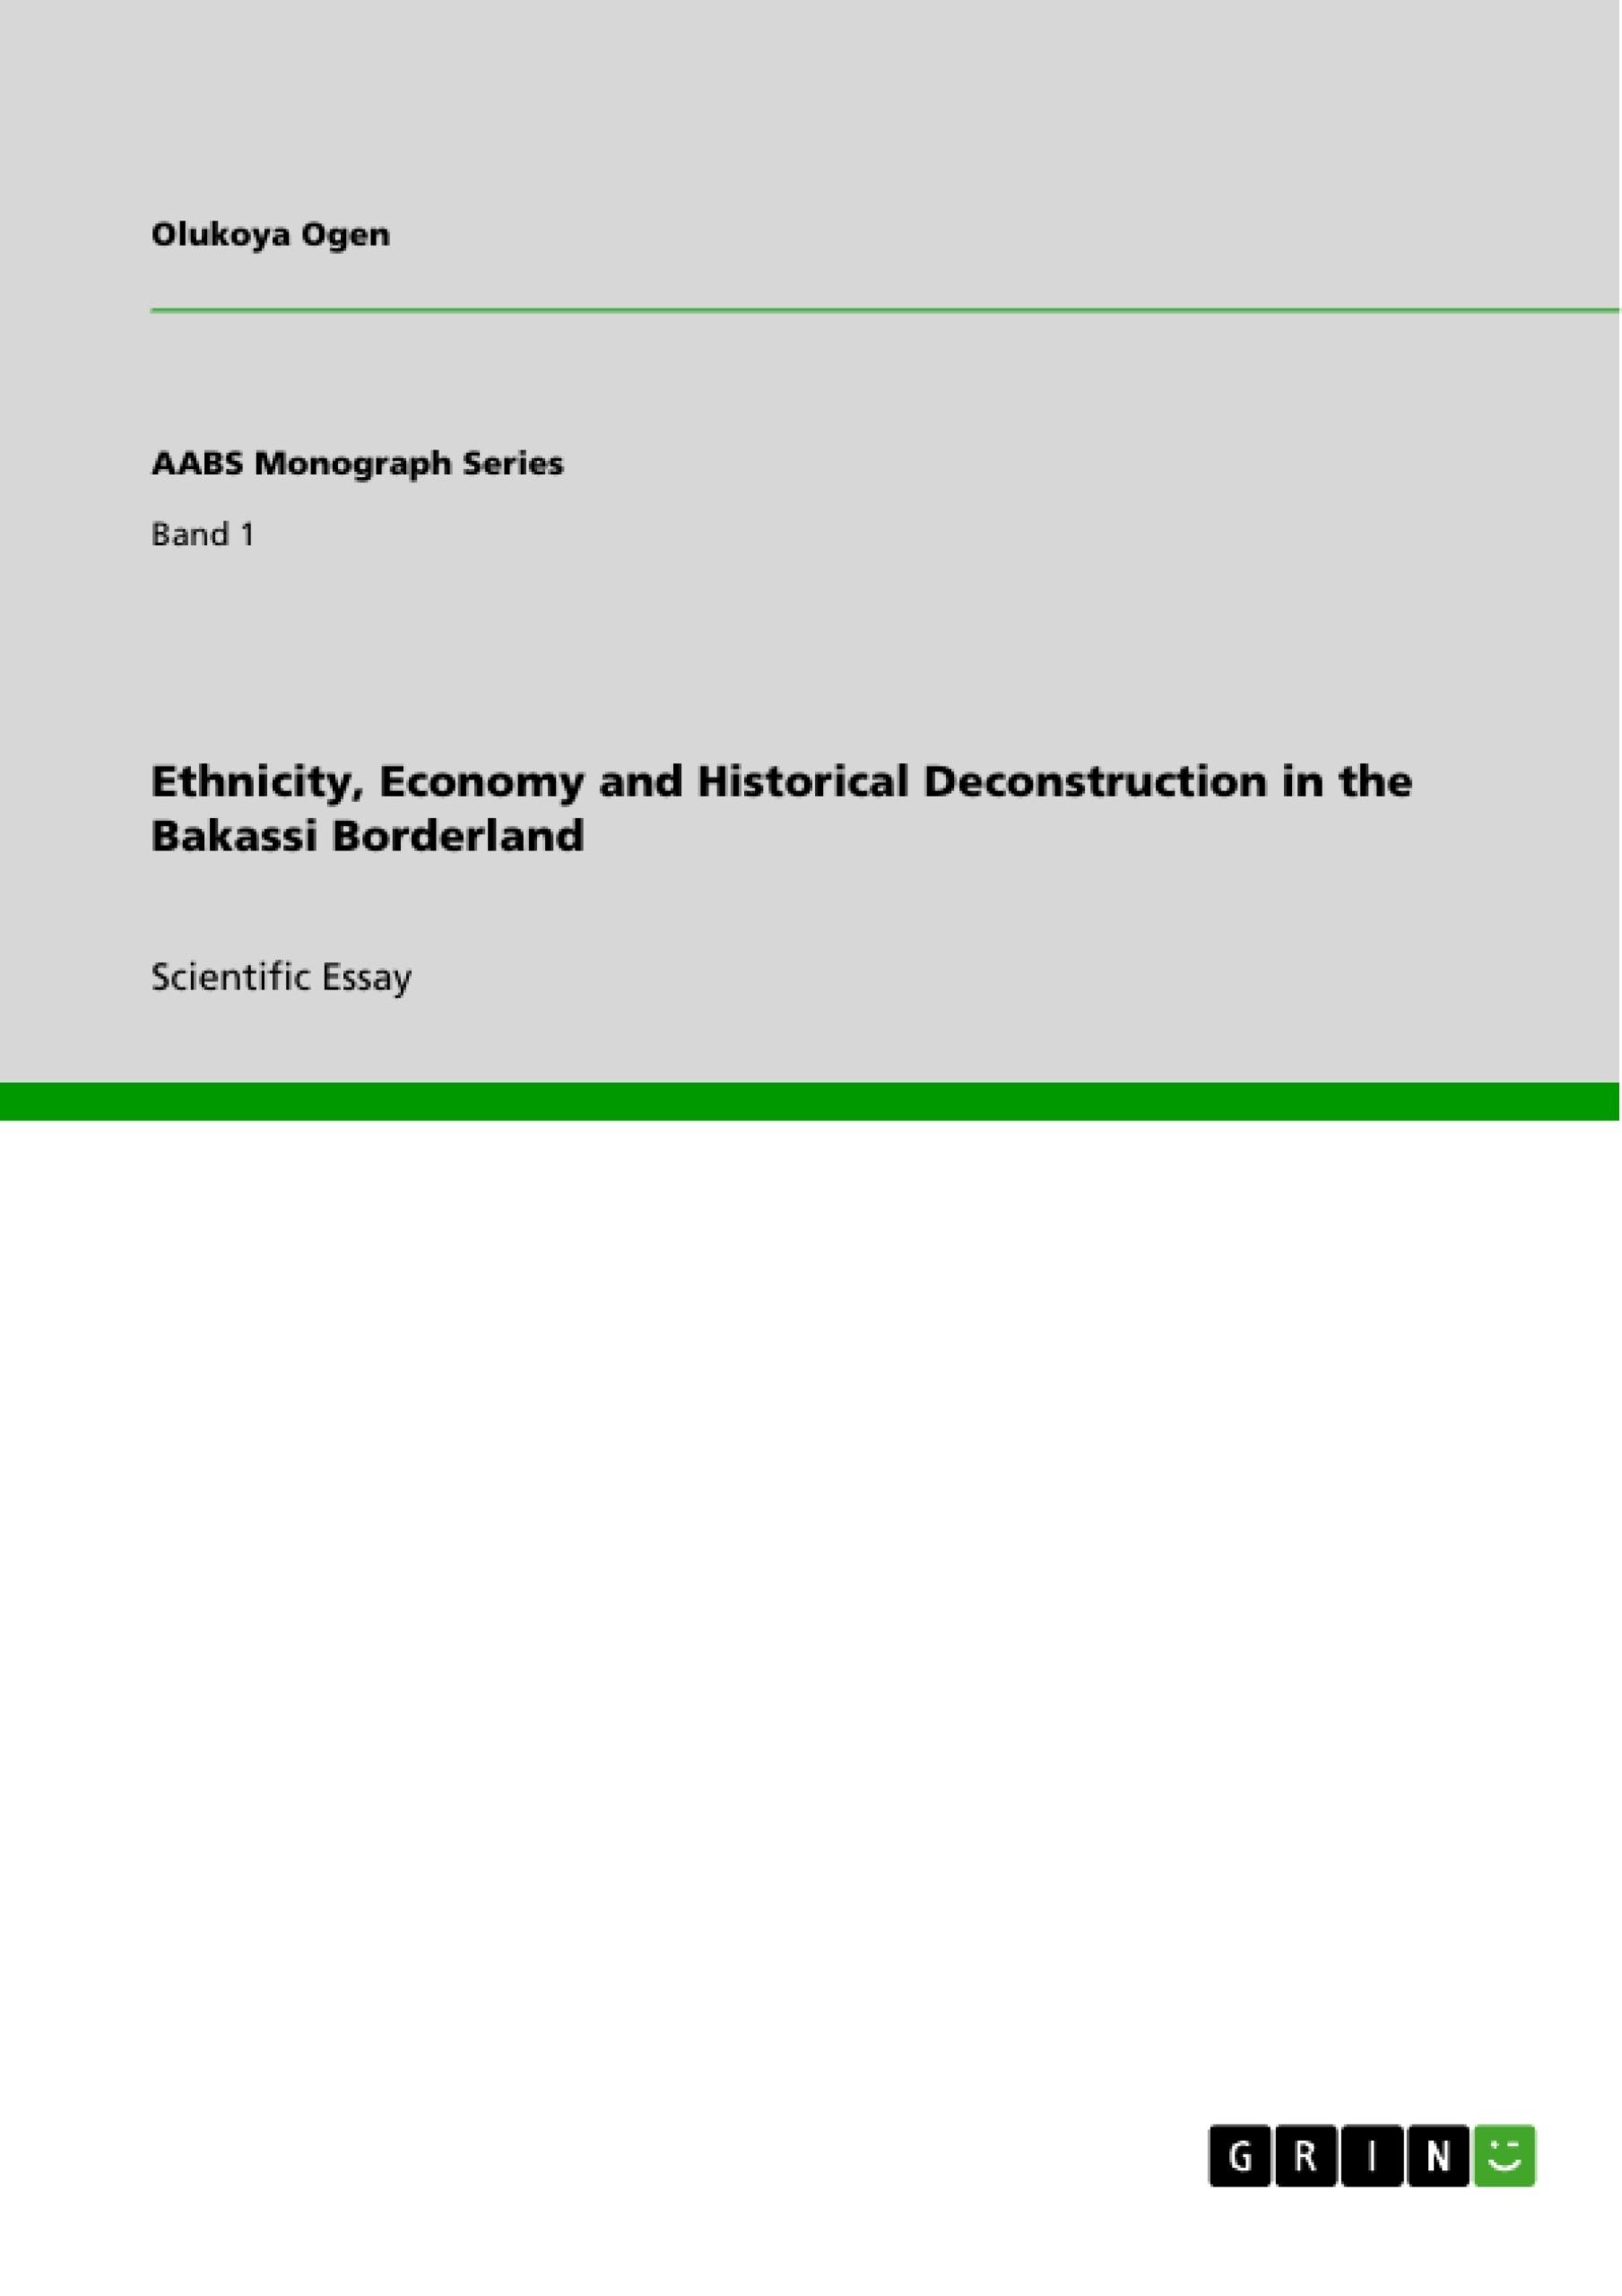 Title: Ethnicity, Economy and Historical Deconstruction in the Bakassi Borderland